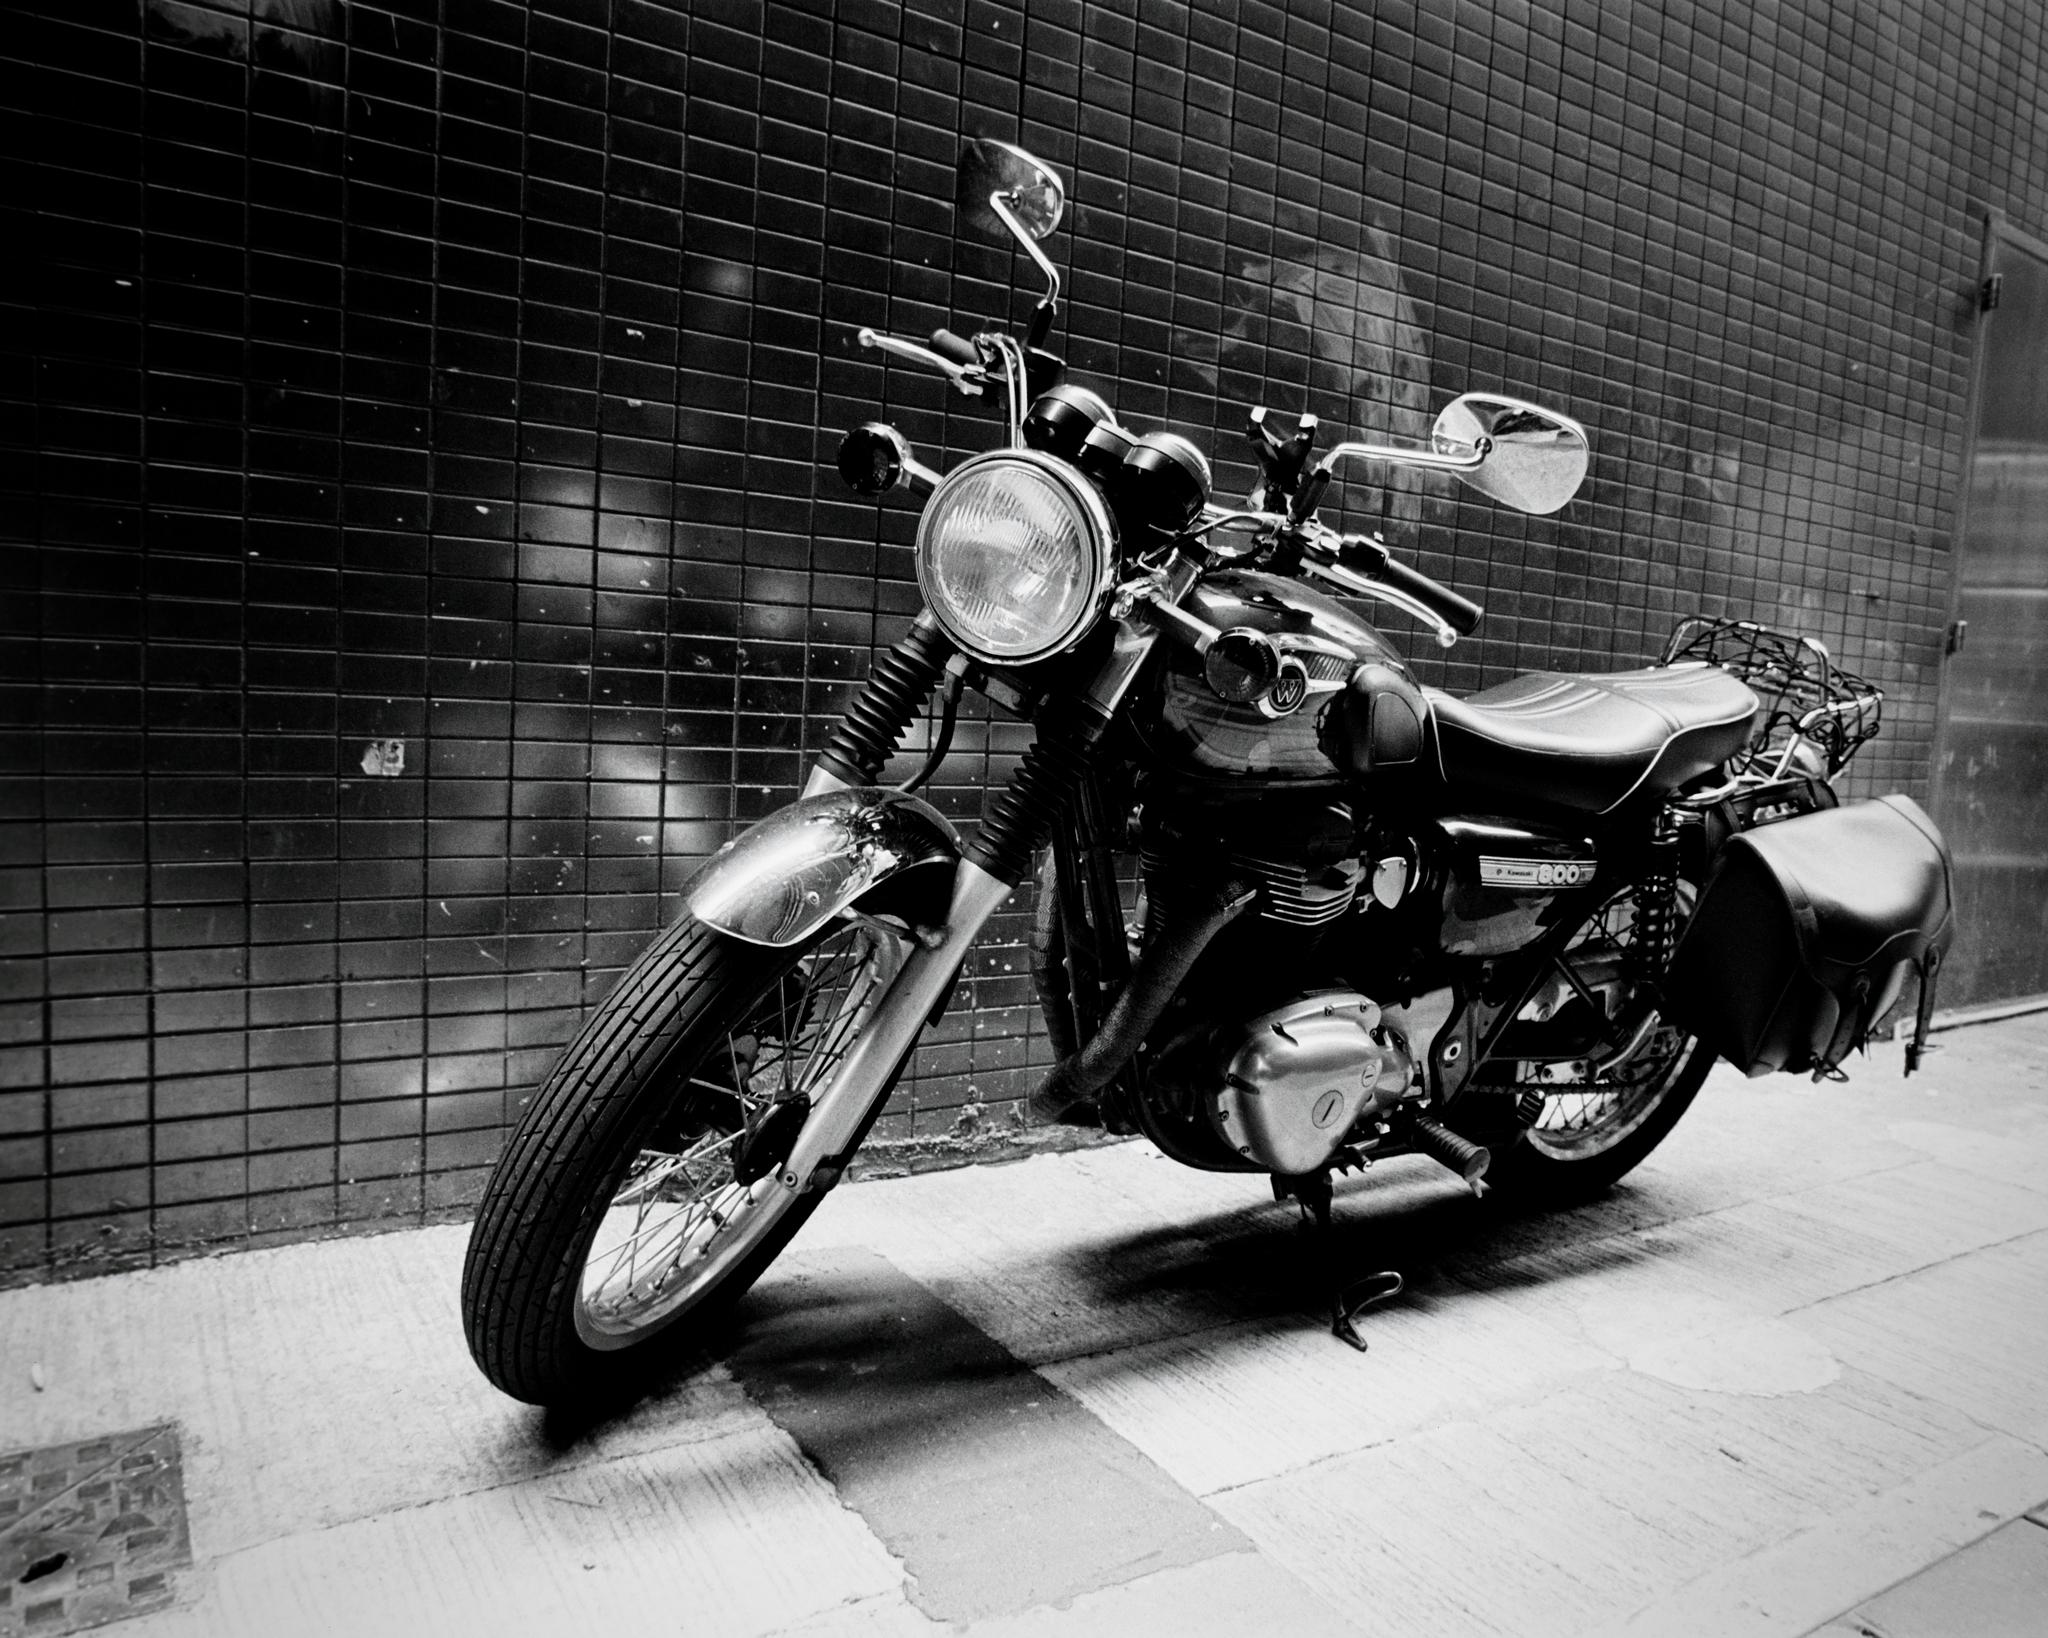 30. Alley Bike